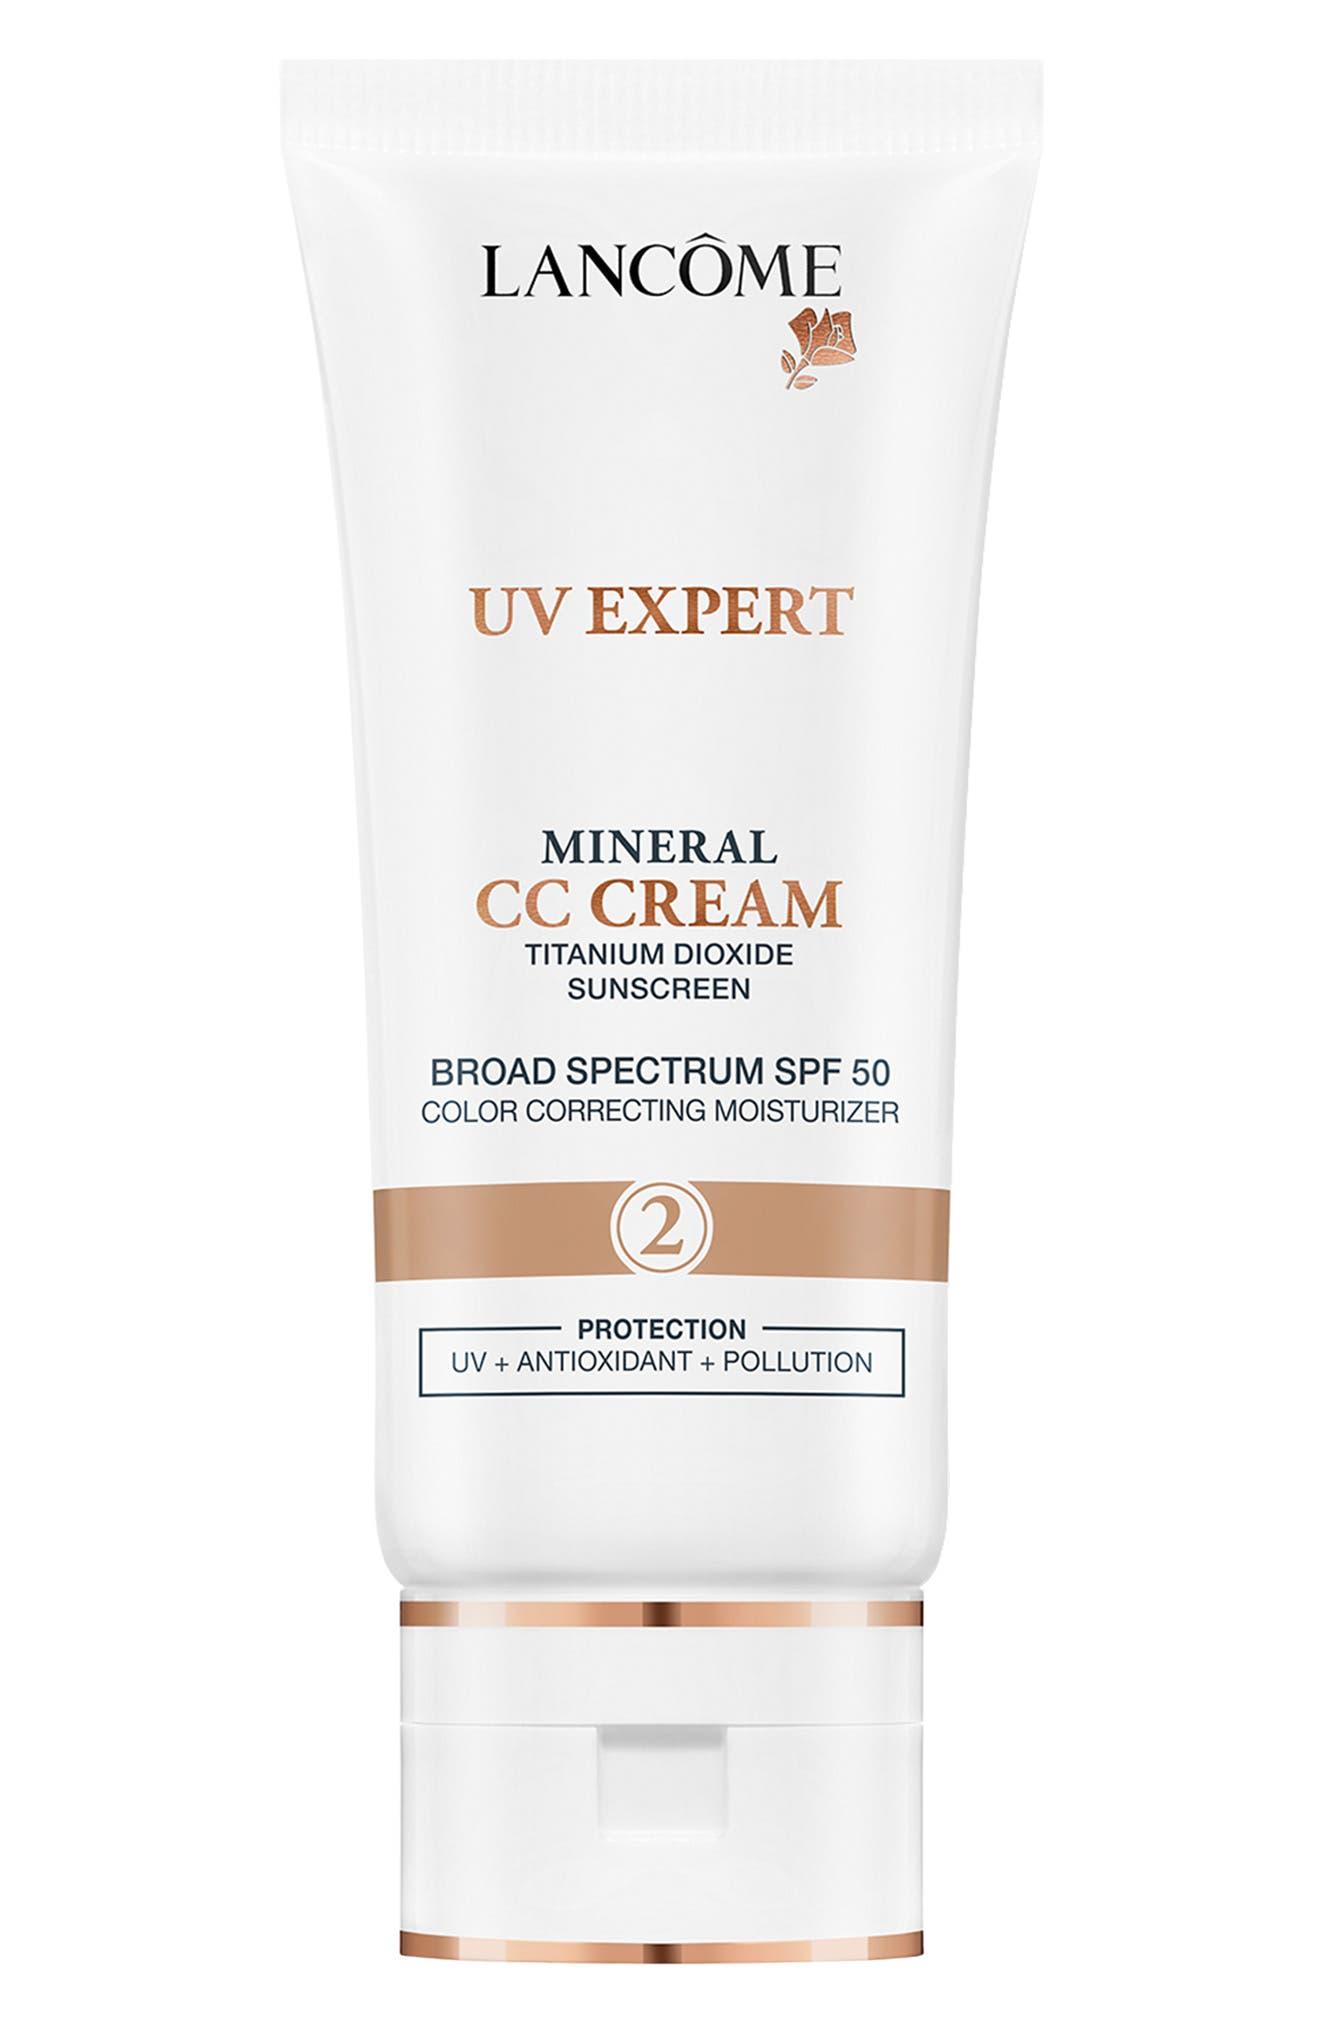 UV Expert Mineral CC Cream Tinted Moisturizer Broad Spectrum SPF 50 | Nordstrom